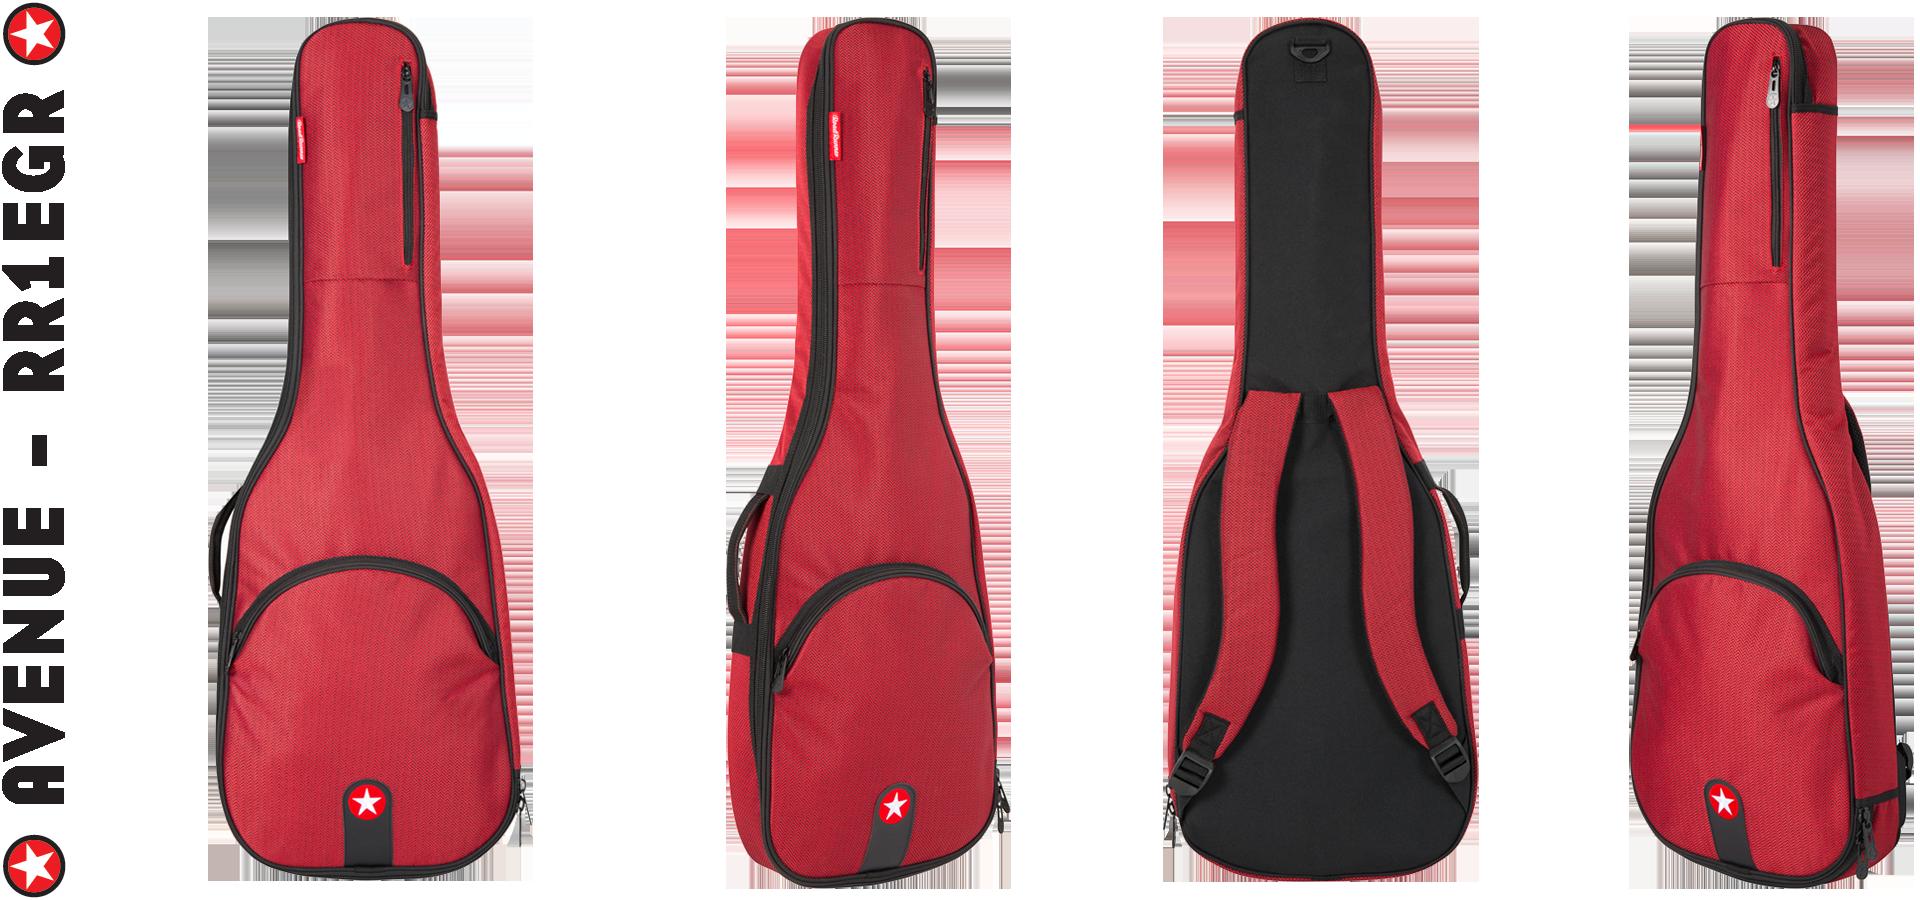 Road Runner RR1EGR Red Tweed Electric Guitar Gig Bag